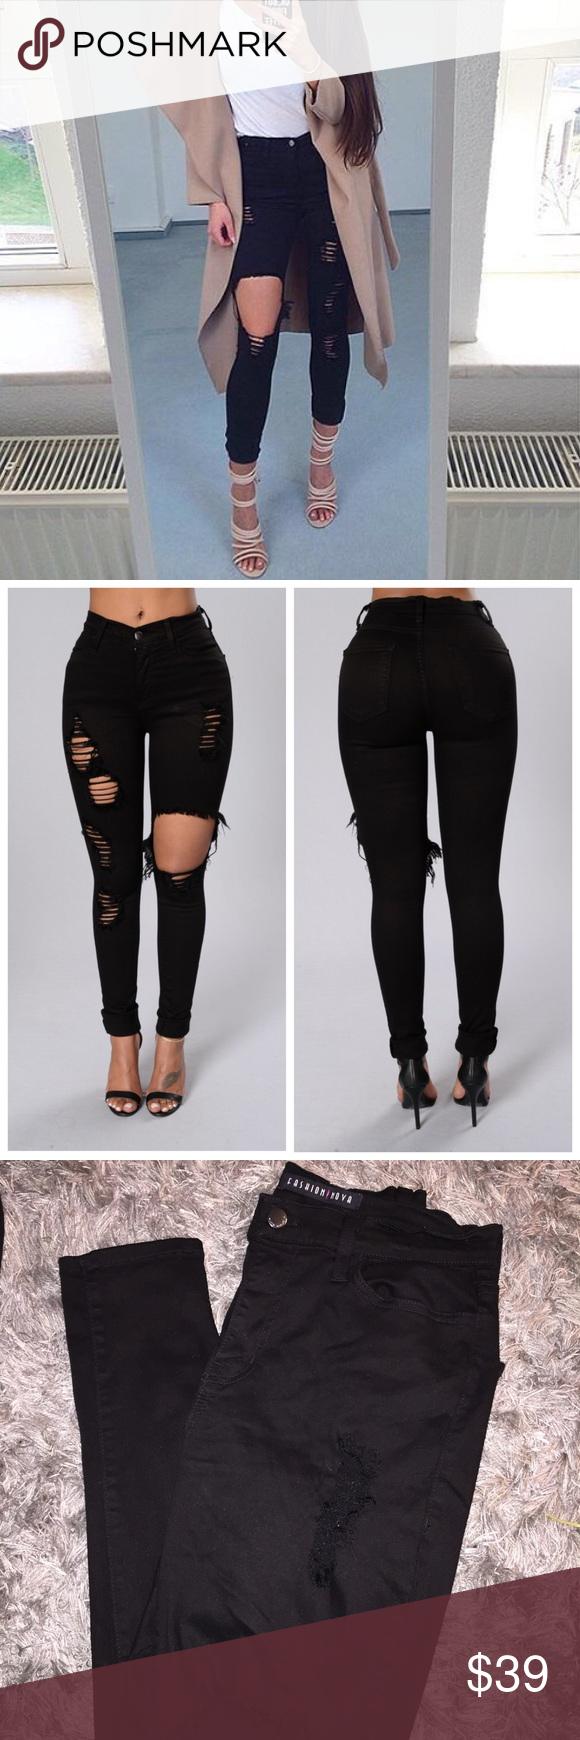 e0d41a463cf Fashion Nova Black Glistening Jeans Fashion Nova Black Glistening Skinny  Jeans Size 11 (29)/distressed design/worn once new condition!